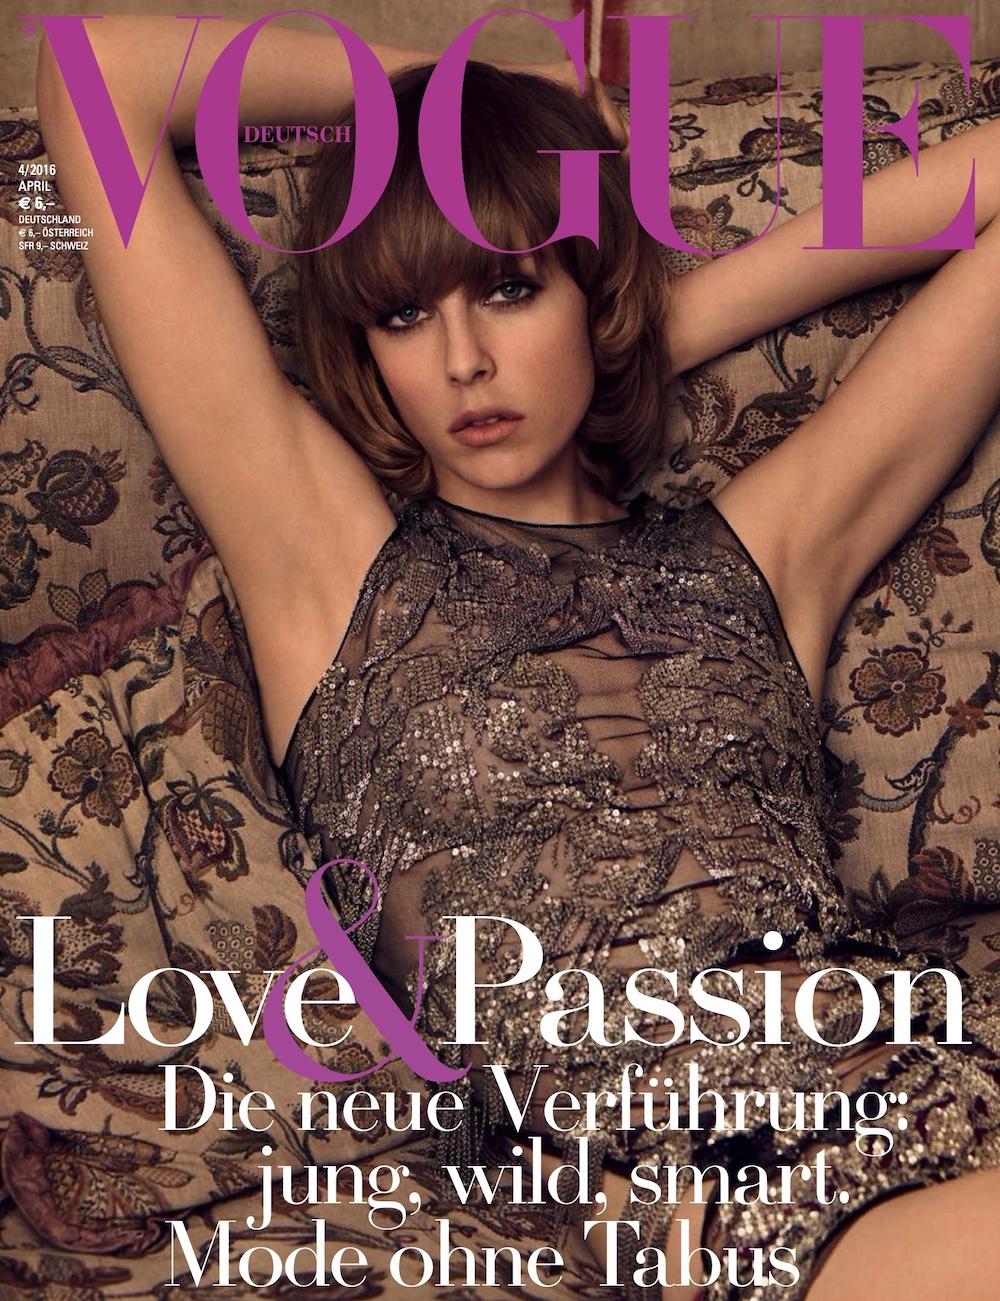 Vogue 2016-04